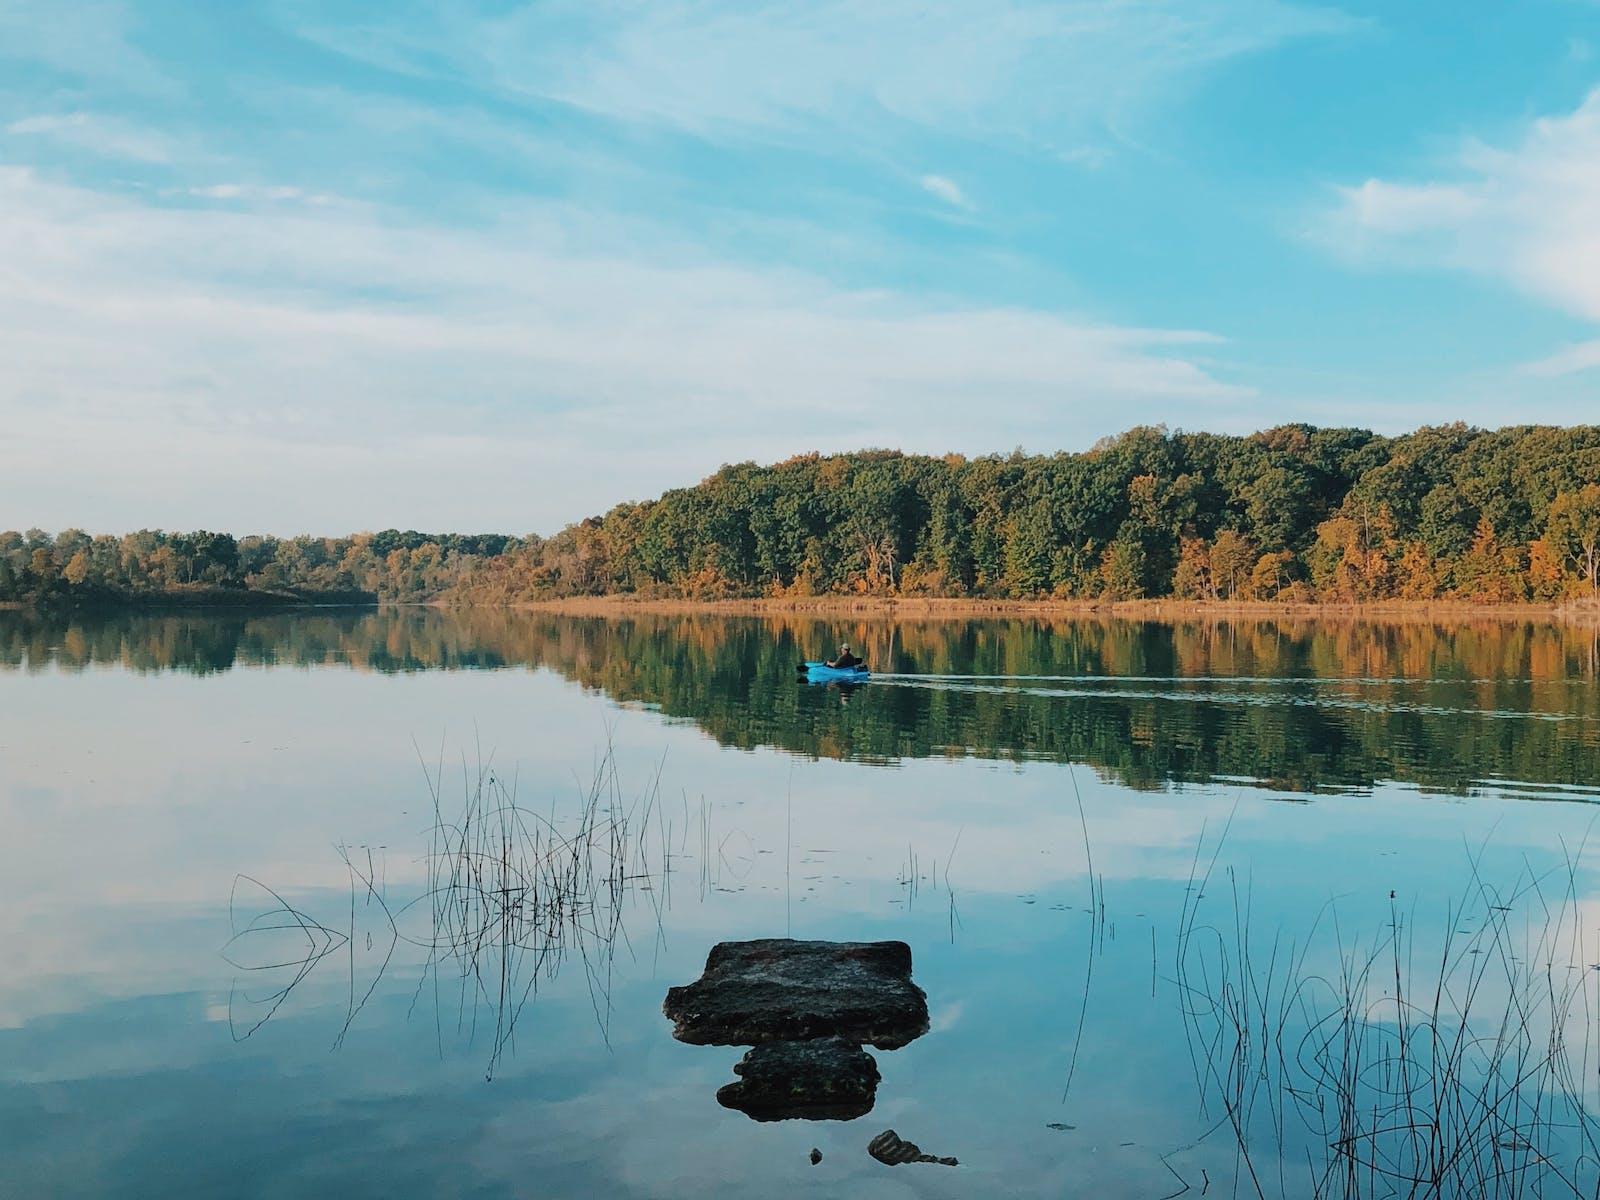 a boat on lake michigan in the fall